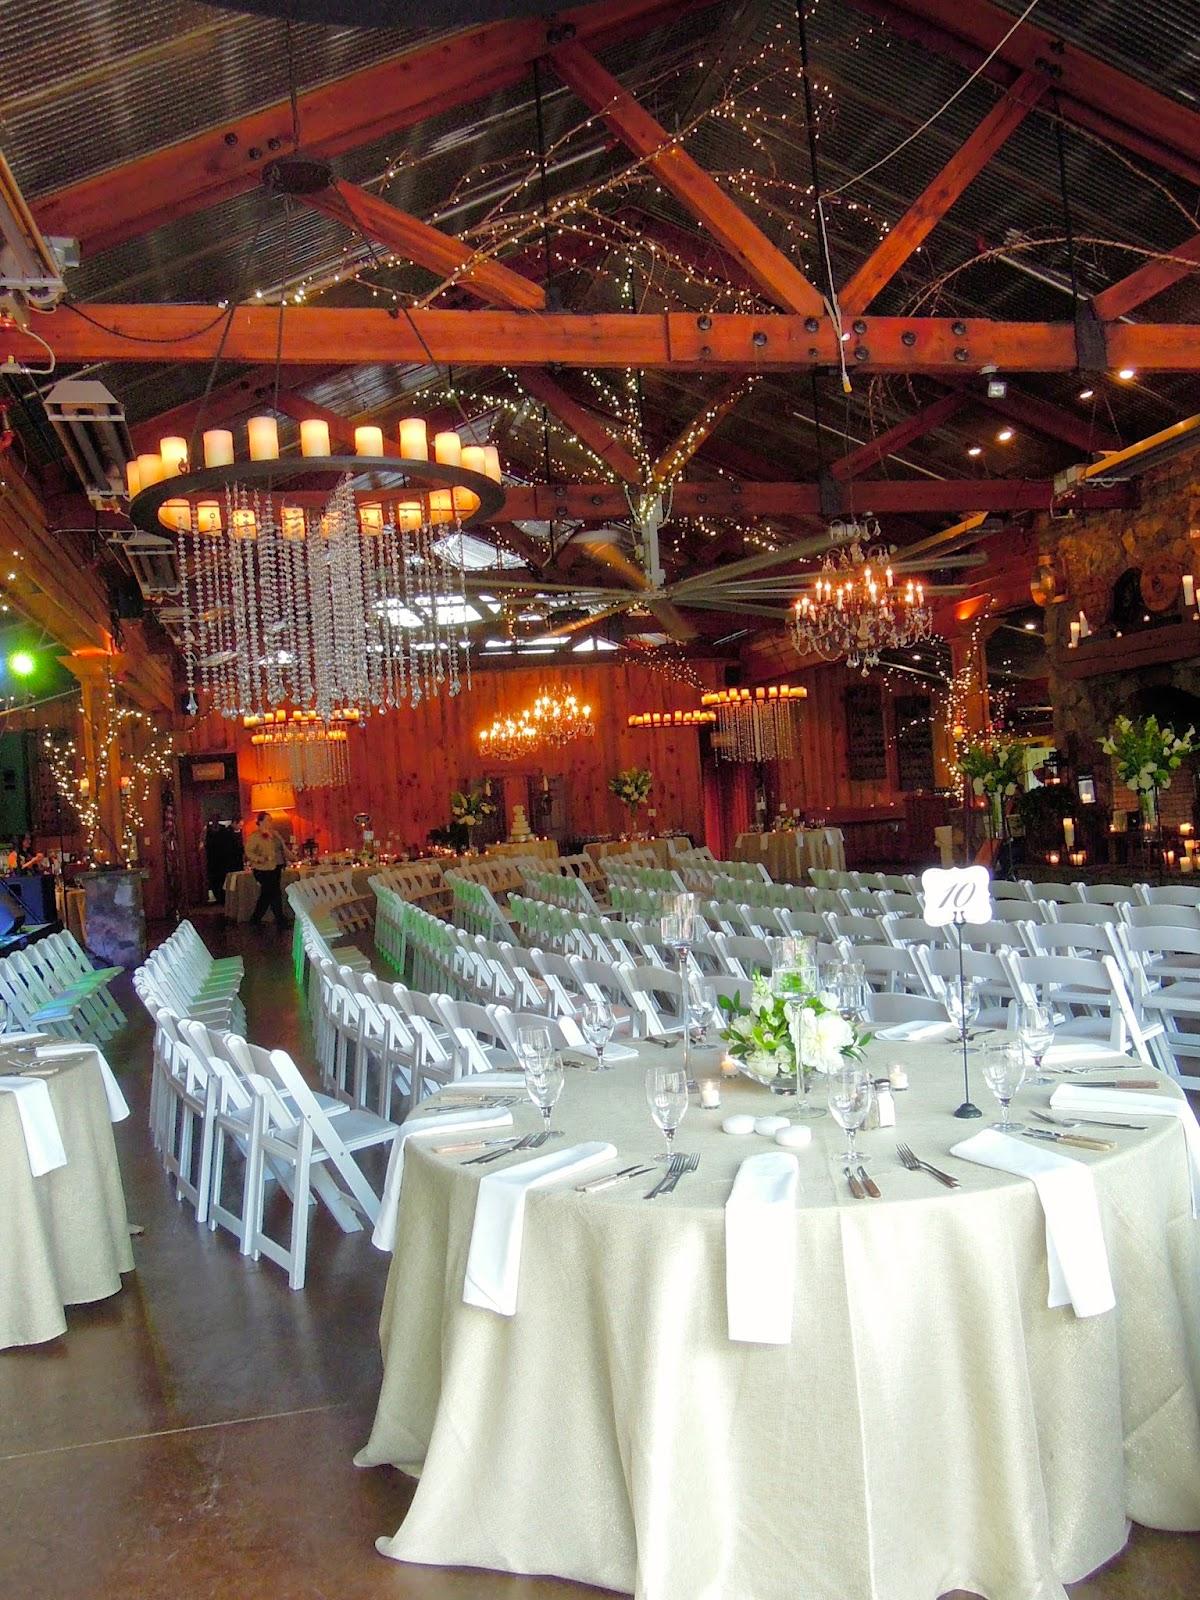 Raleigh Wedding Blog: Stephanie and Jay Wed at Angus Barn ...